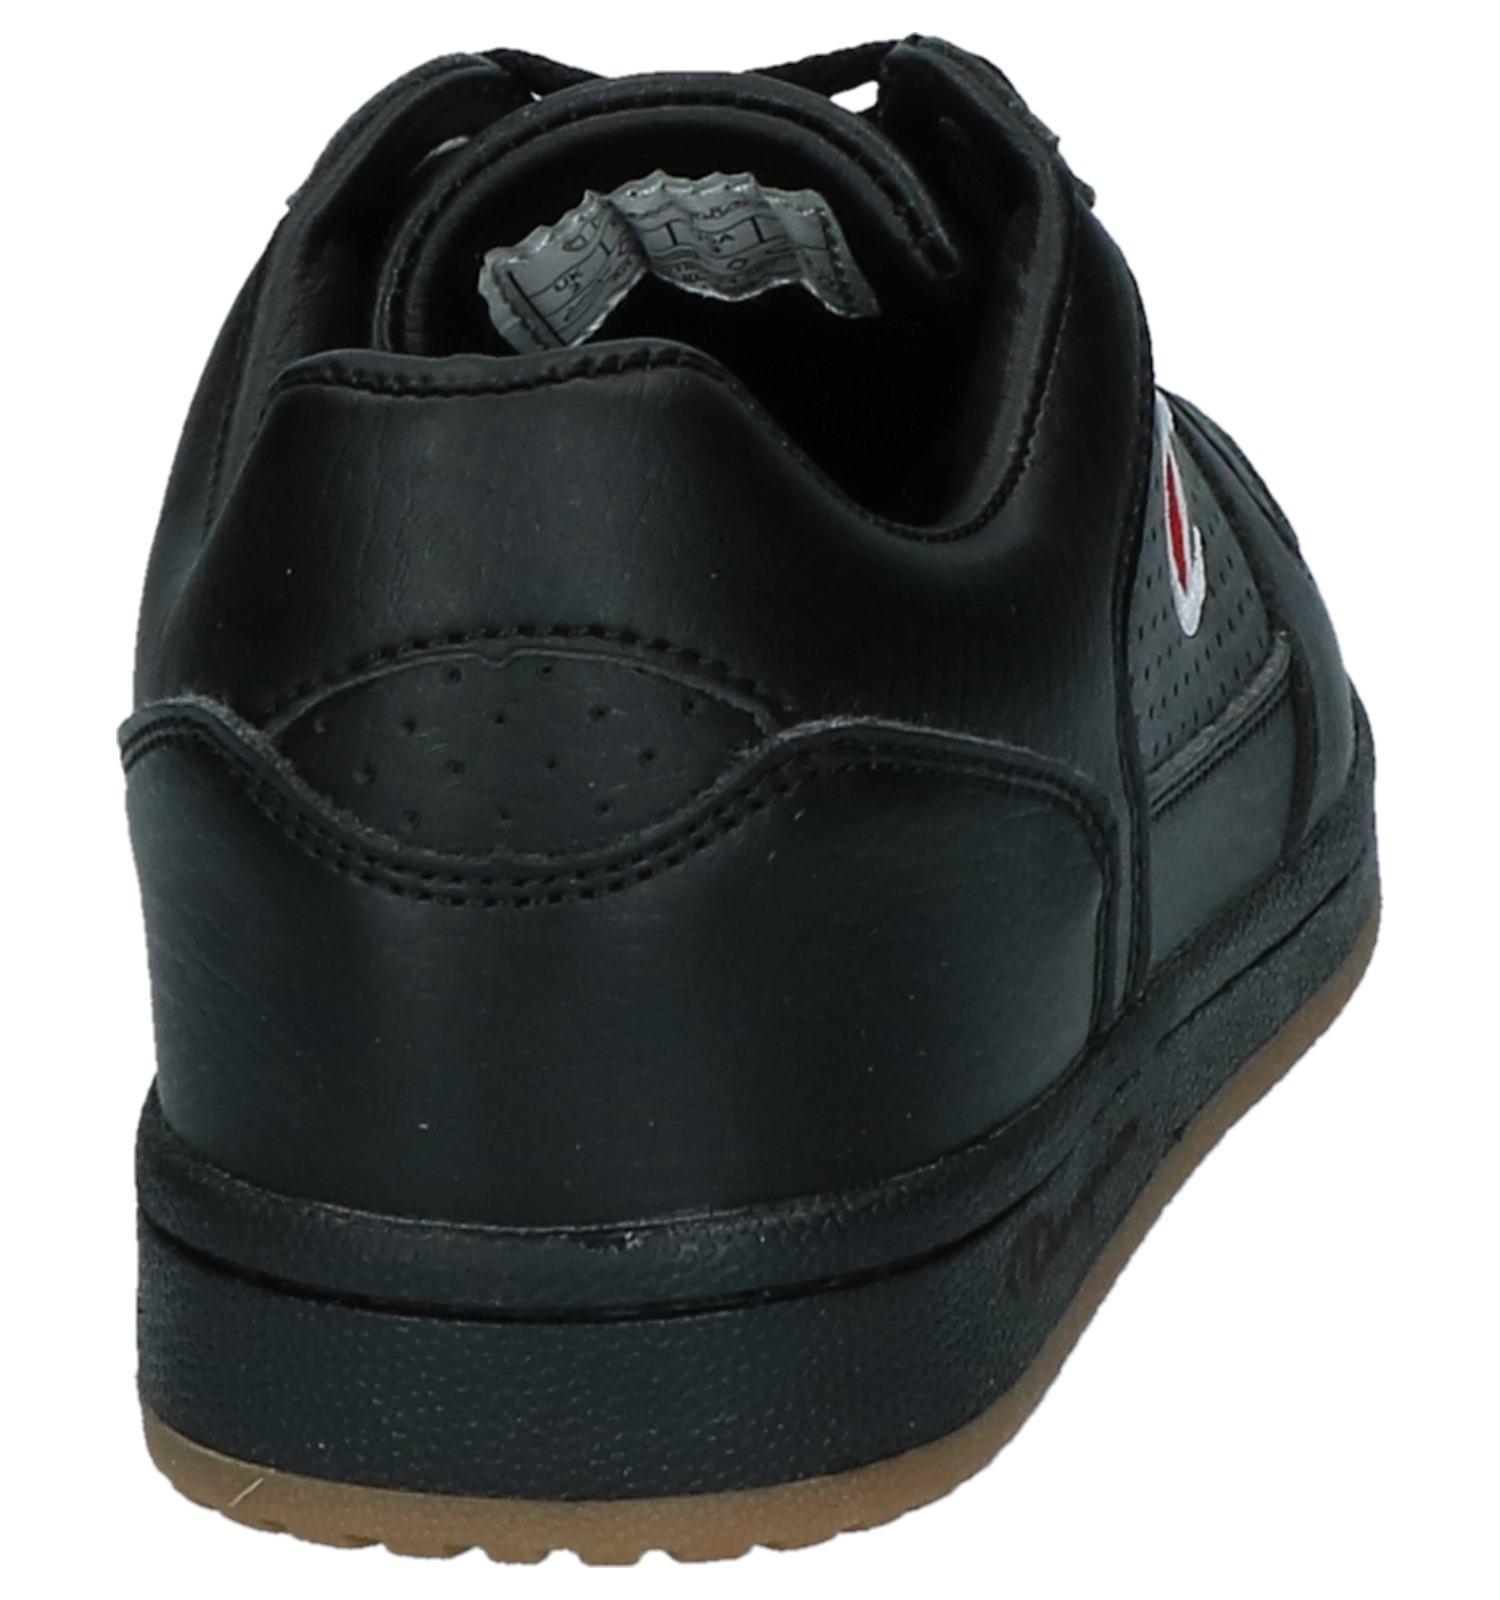 cb7e717b29e Sneakers Zwart Champion Chicago Basket | TORFS.BE | Gratis verzend en retour